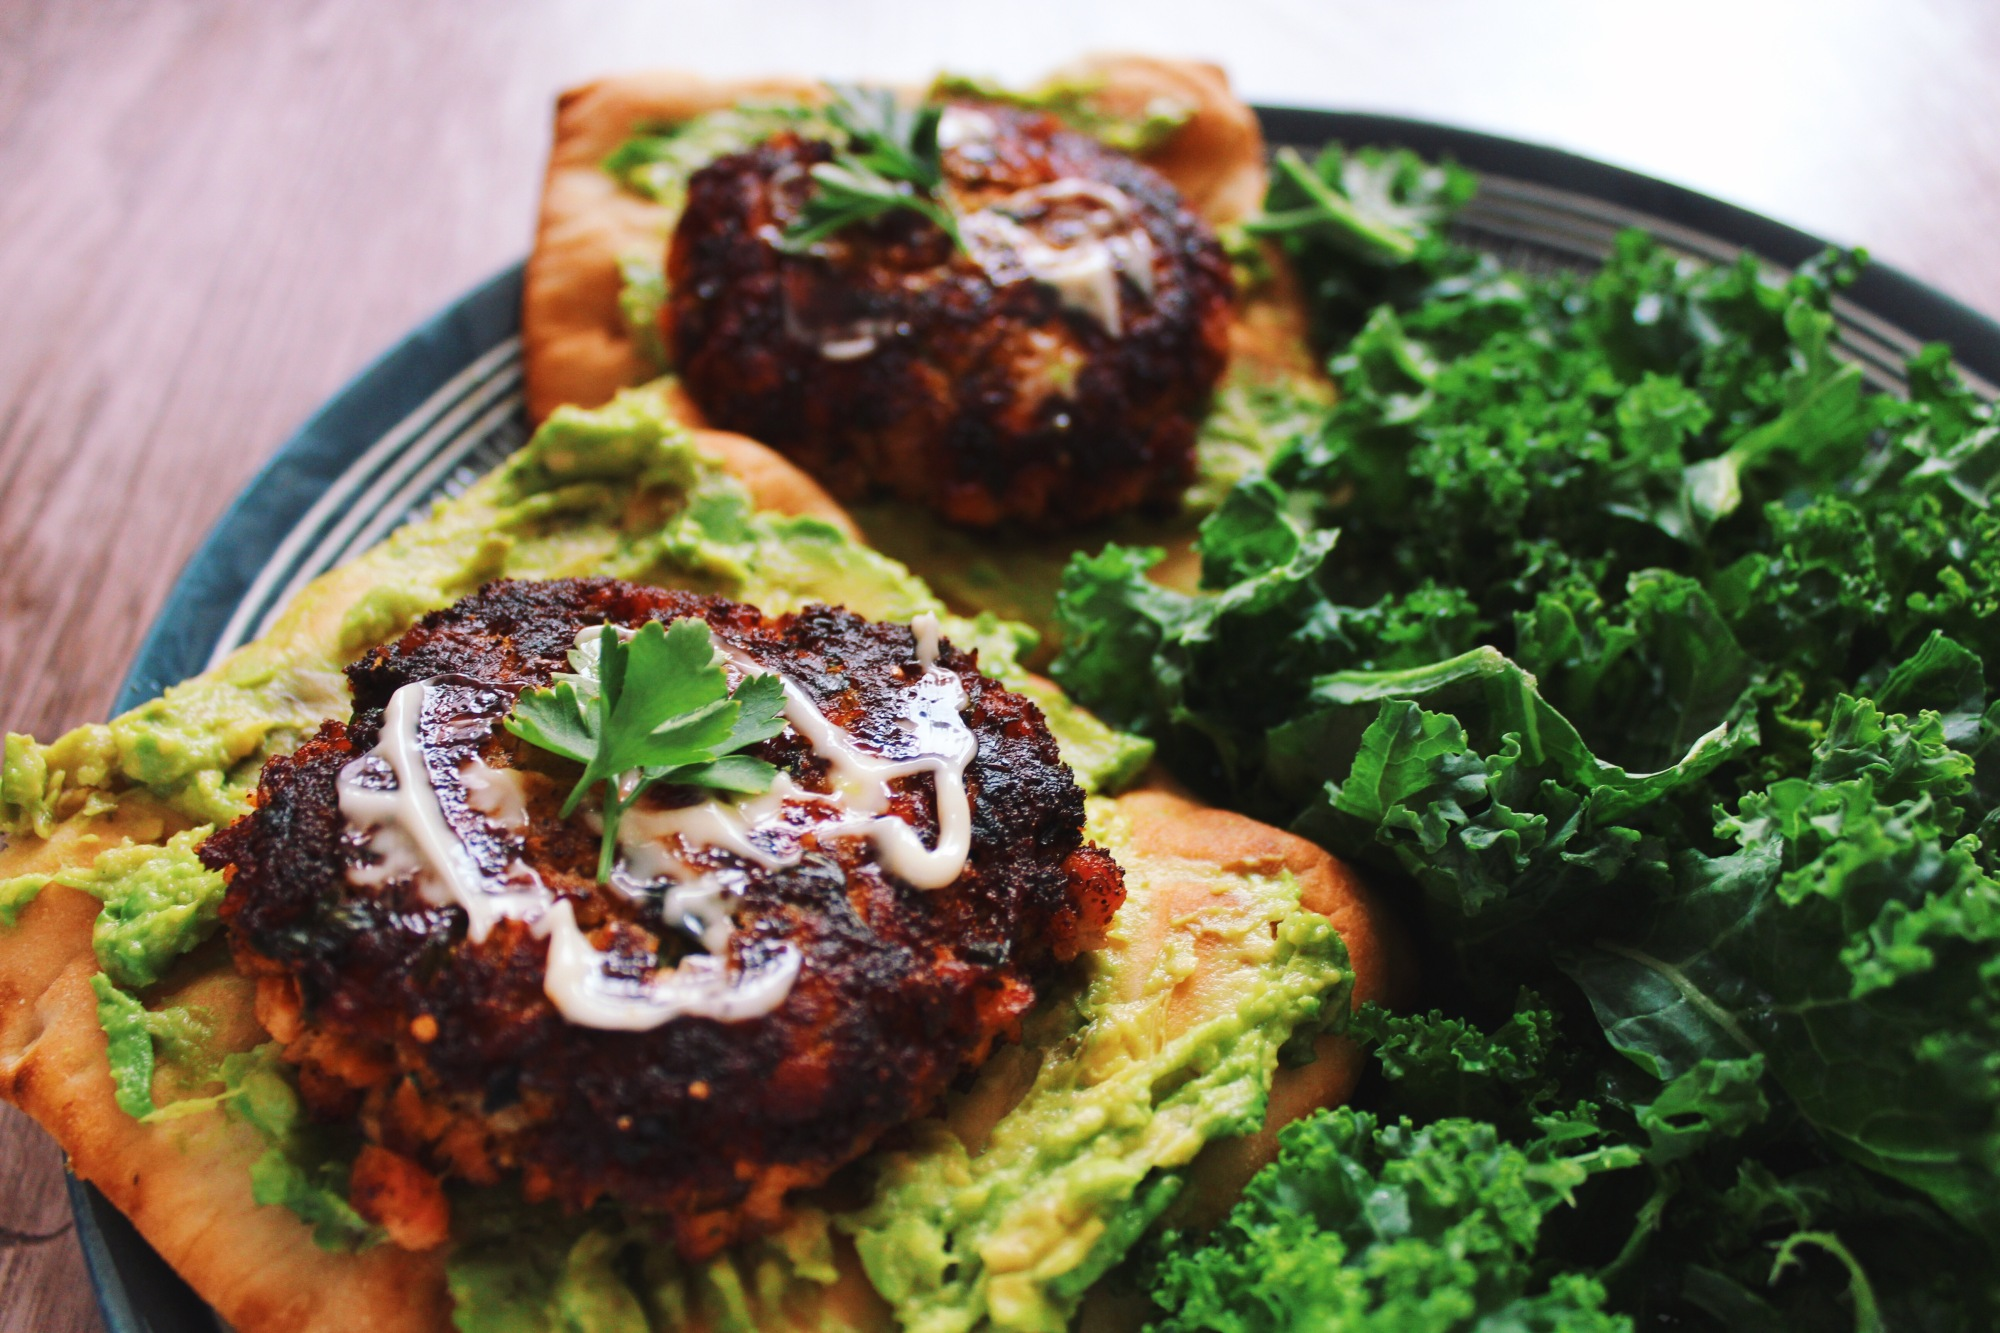 Salmon burgers on avocado flatbread toast with a kale salad